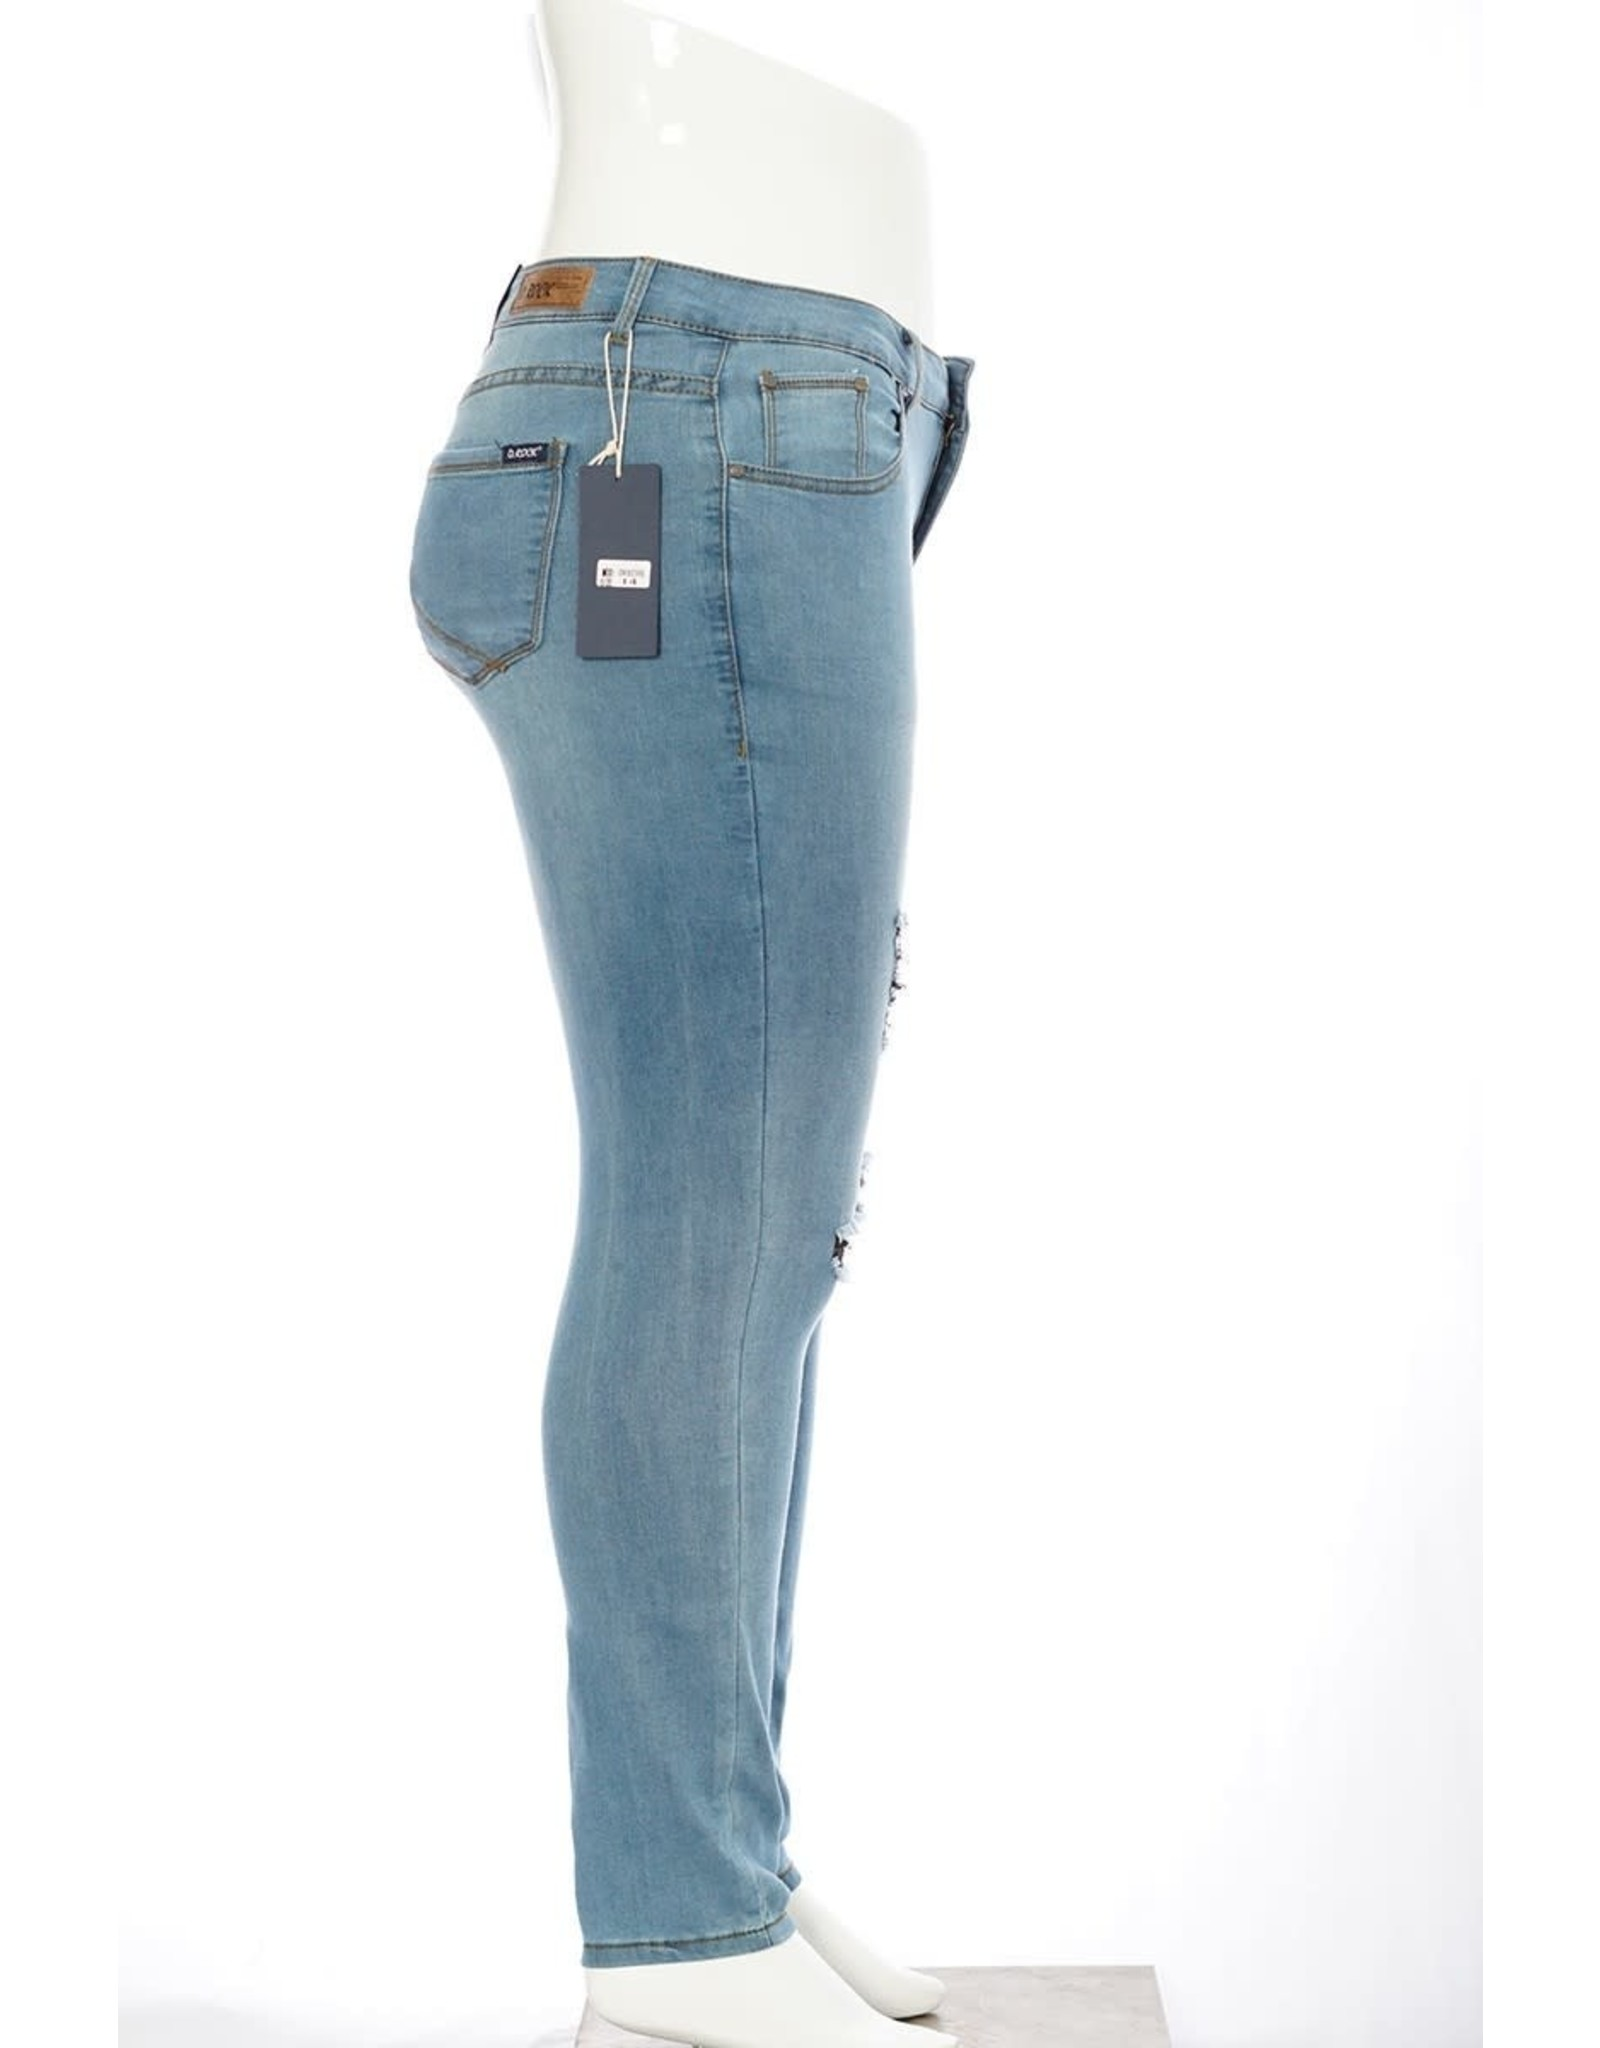 D. Rock Soft Denim Distressed Jeans